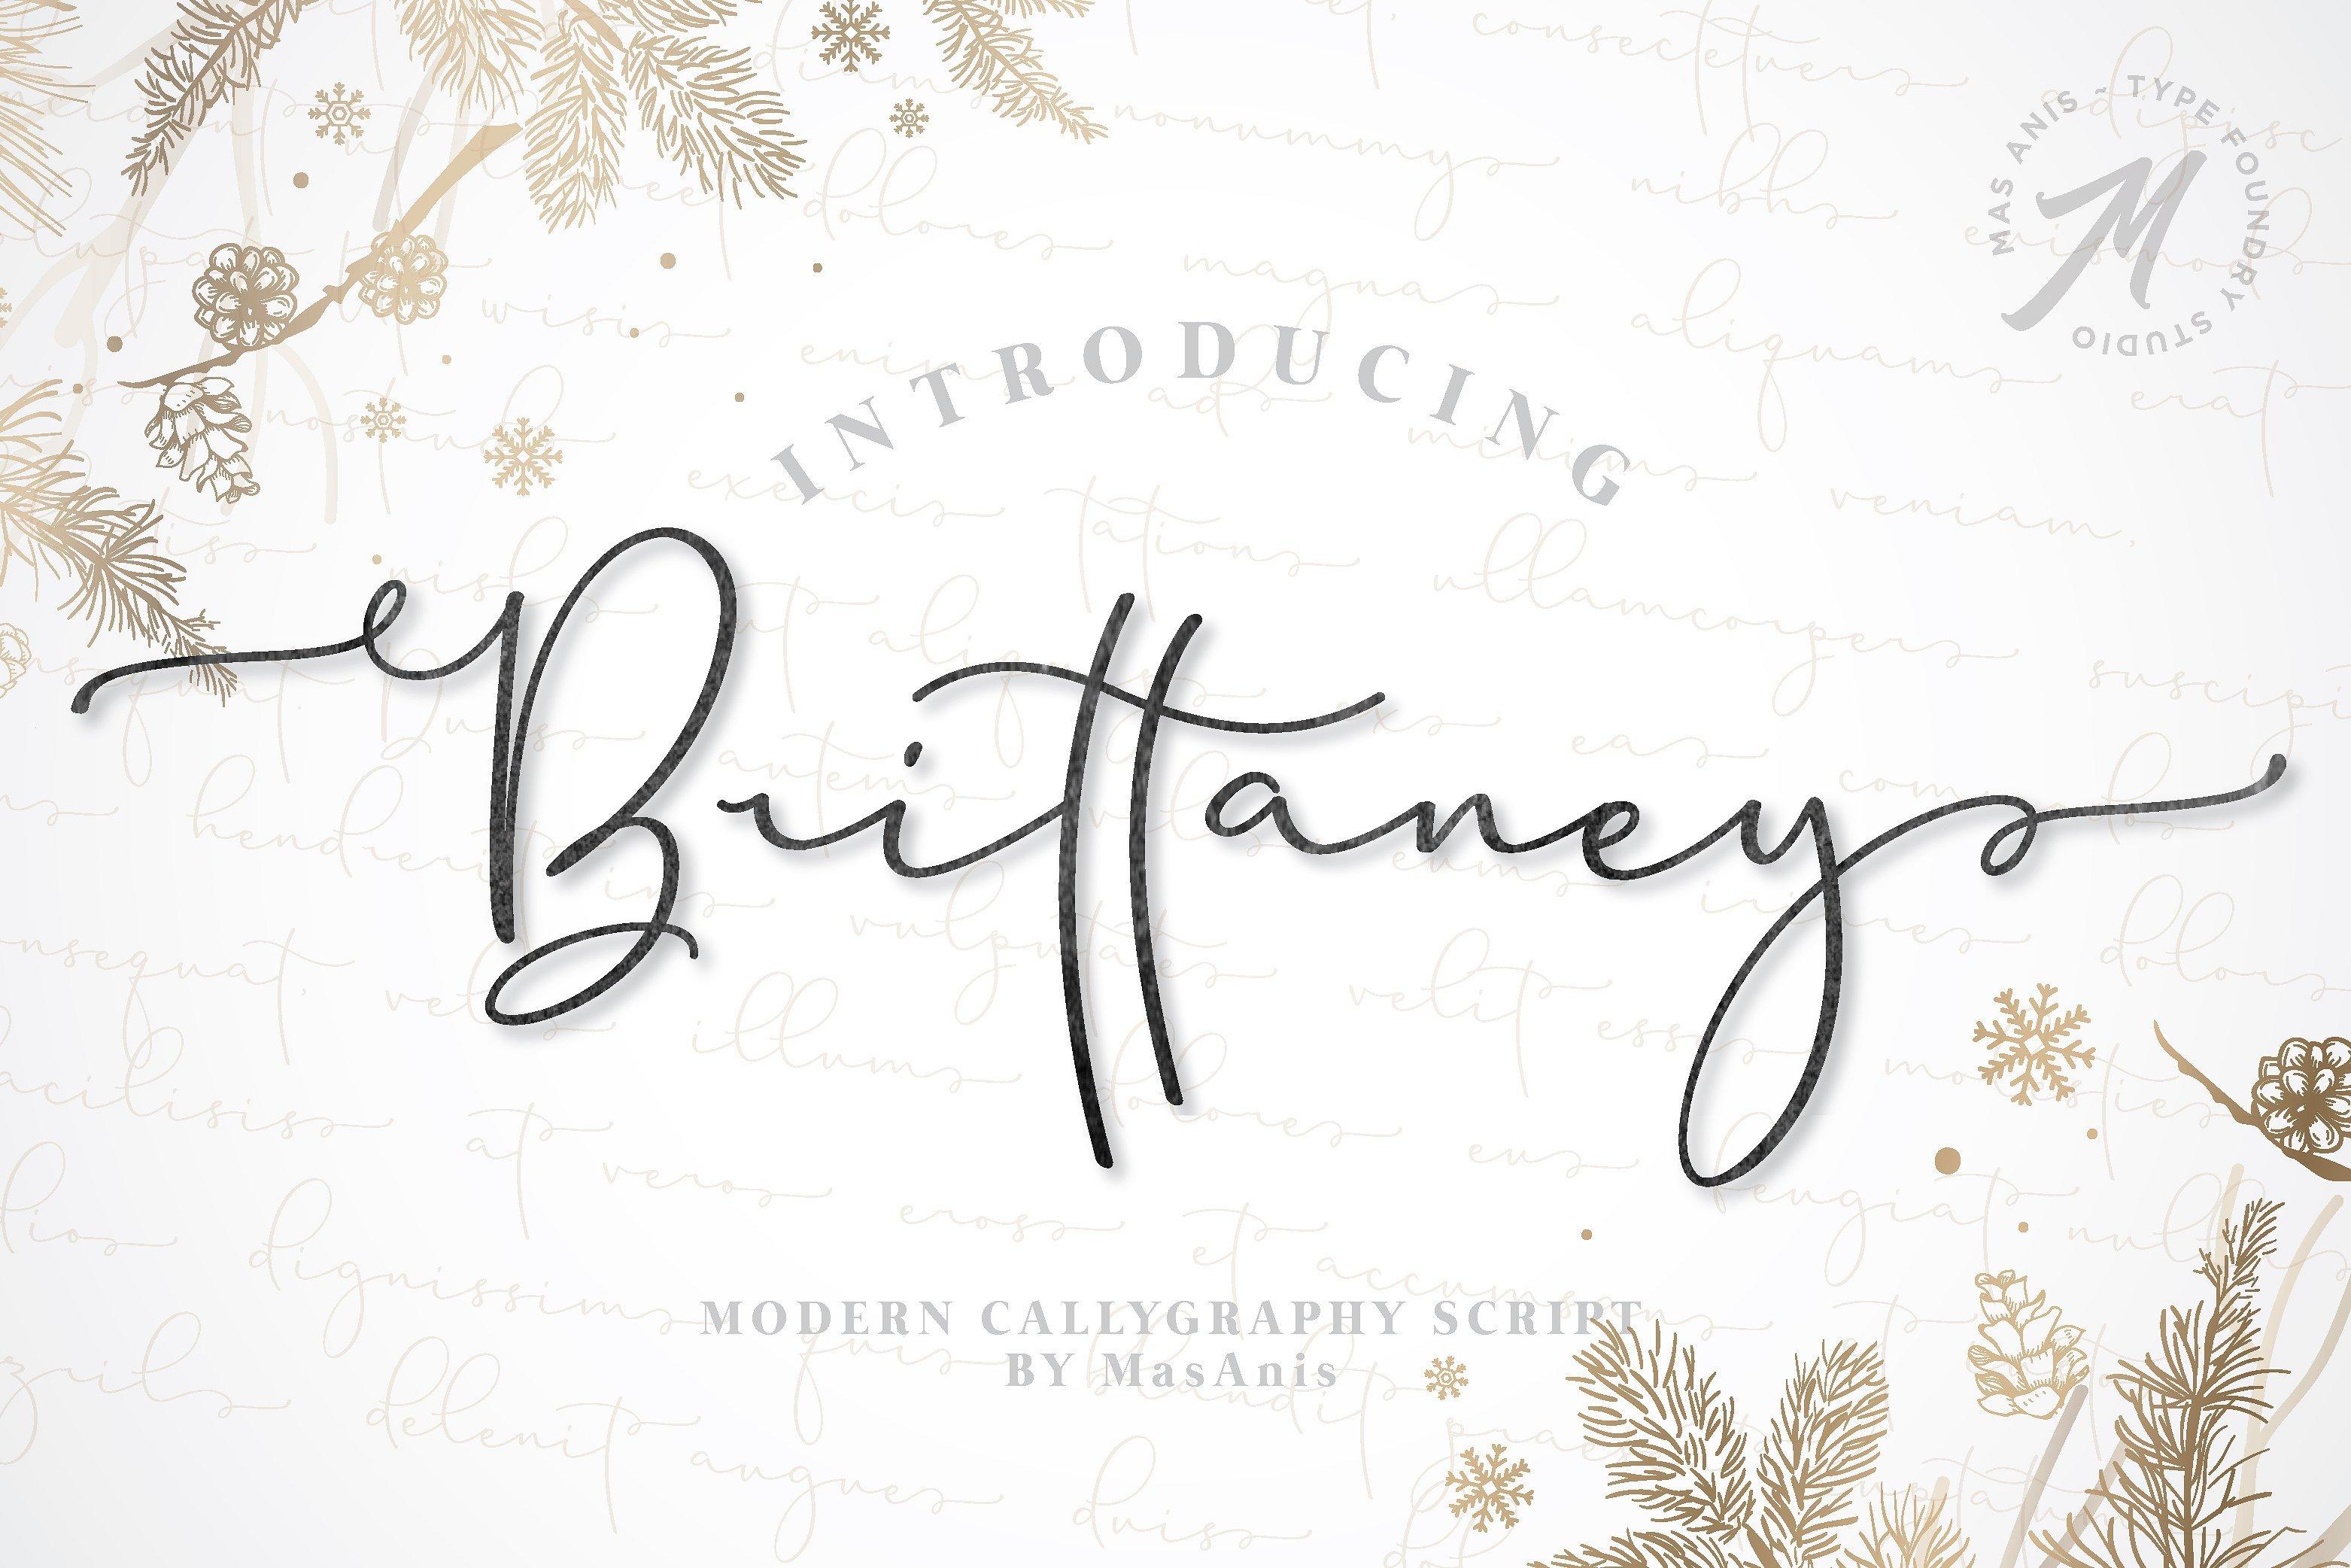 https://fontclarity.com/wp-content/uploads/2019/09/brittaney-script-font-download-0.jpg Free Download